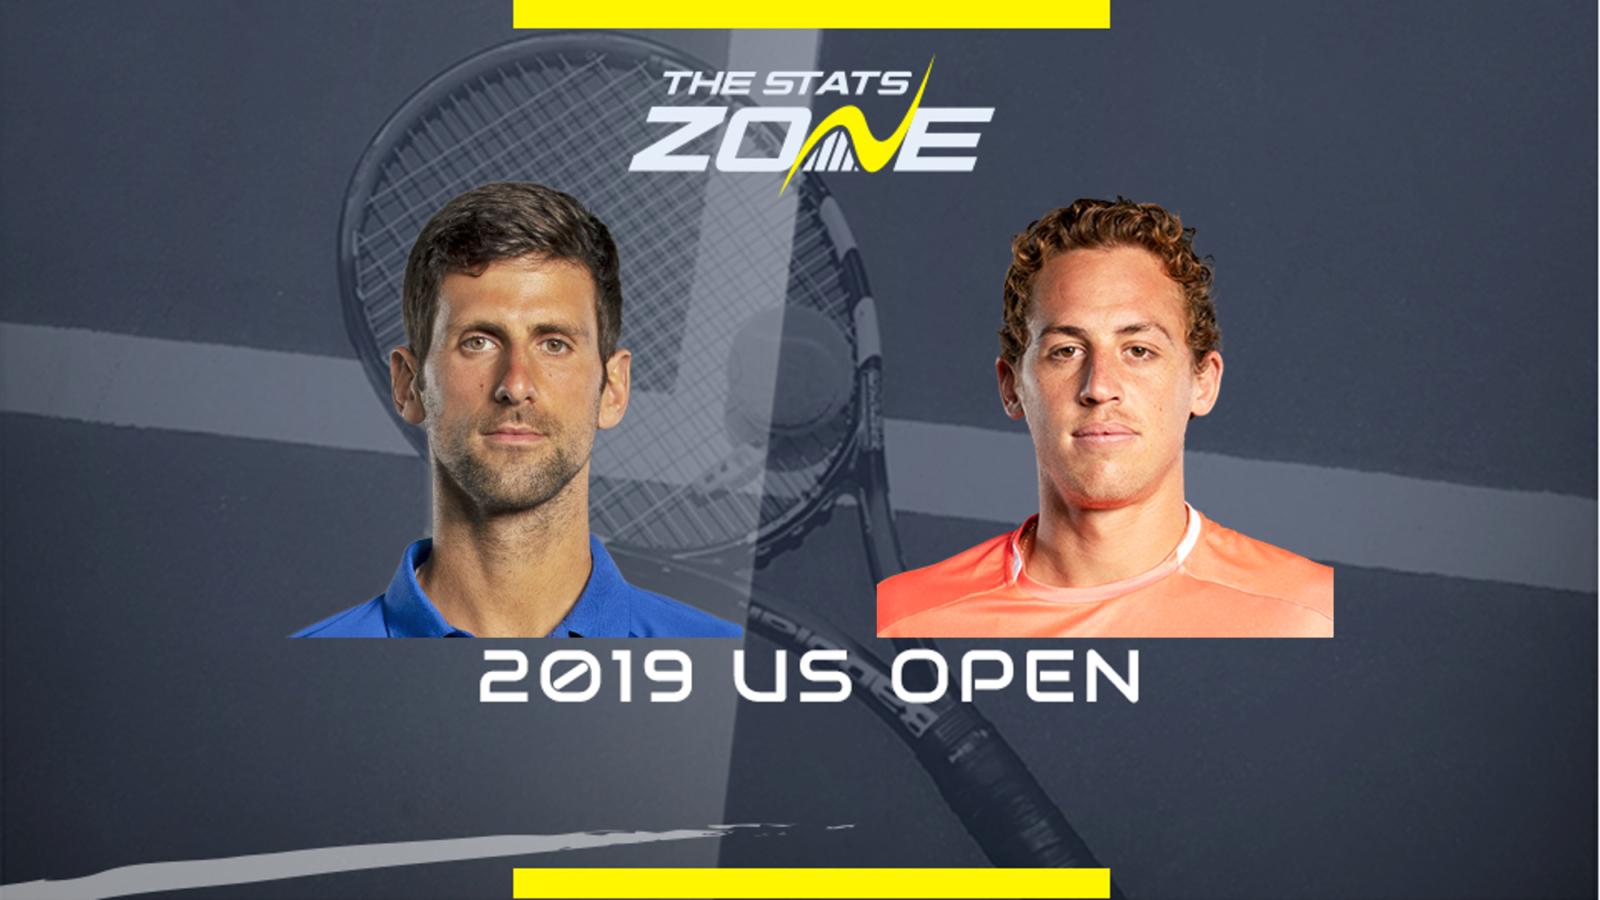 'Pain free' Djokovic into US Open last 16